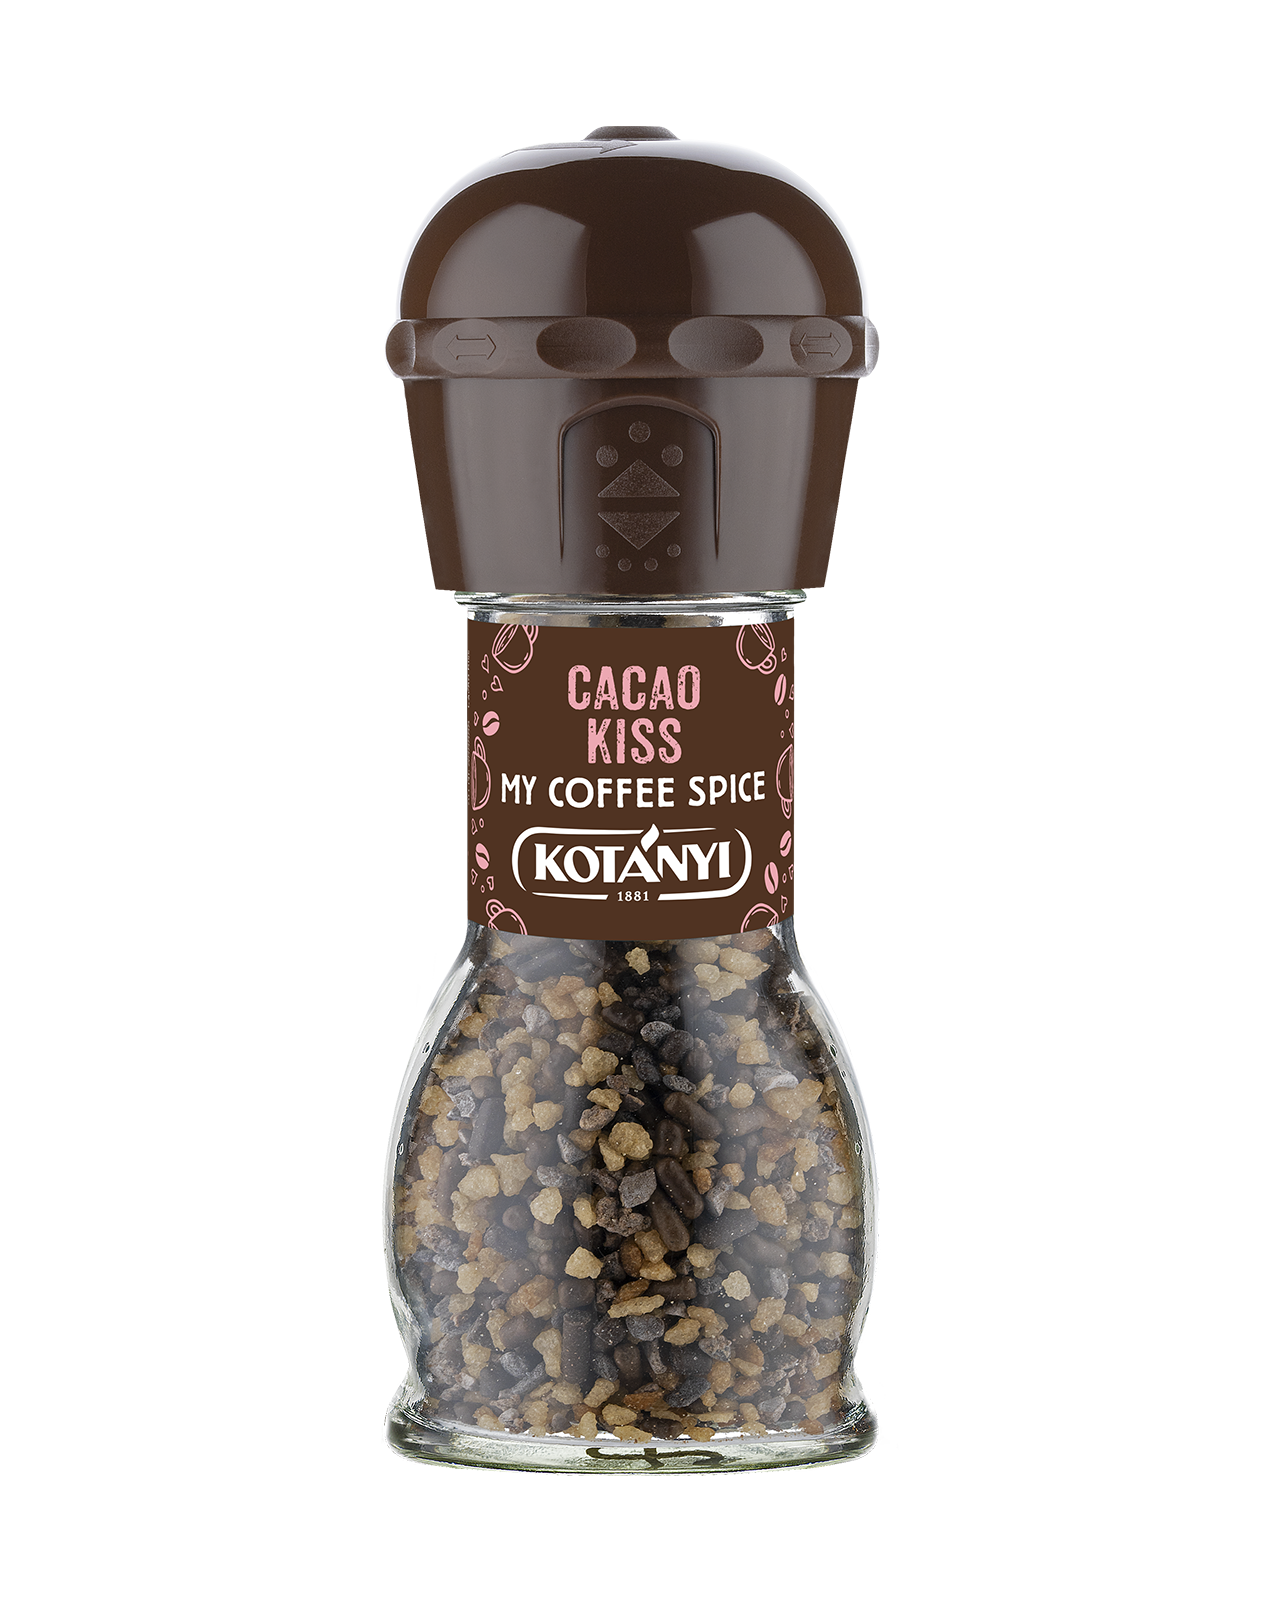 438010 Kotanyi Cacao Kiss B2c Mill Disposable